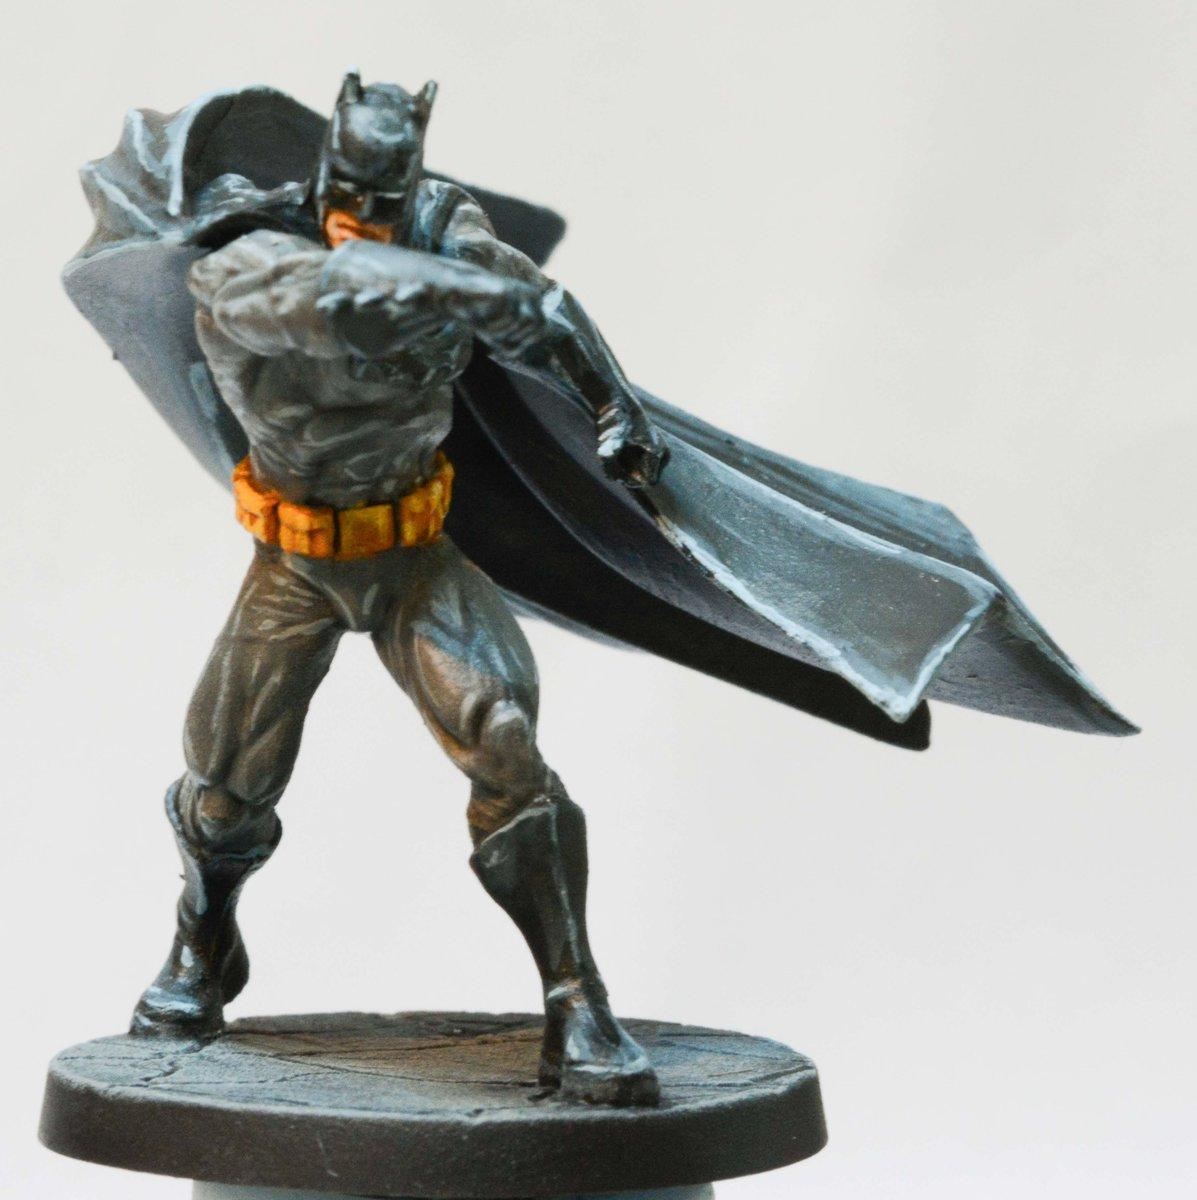 large.Batman-0148.JPG.ad794c3e5f95639305fce2d17b7eb621.JPG